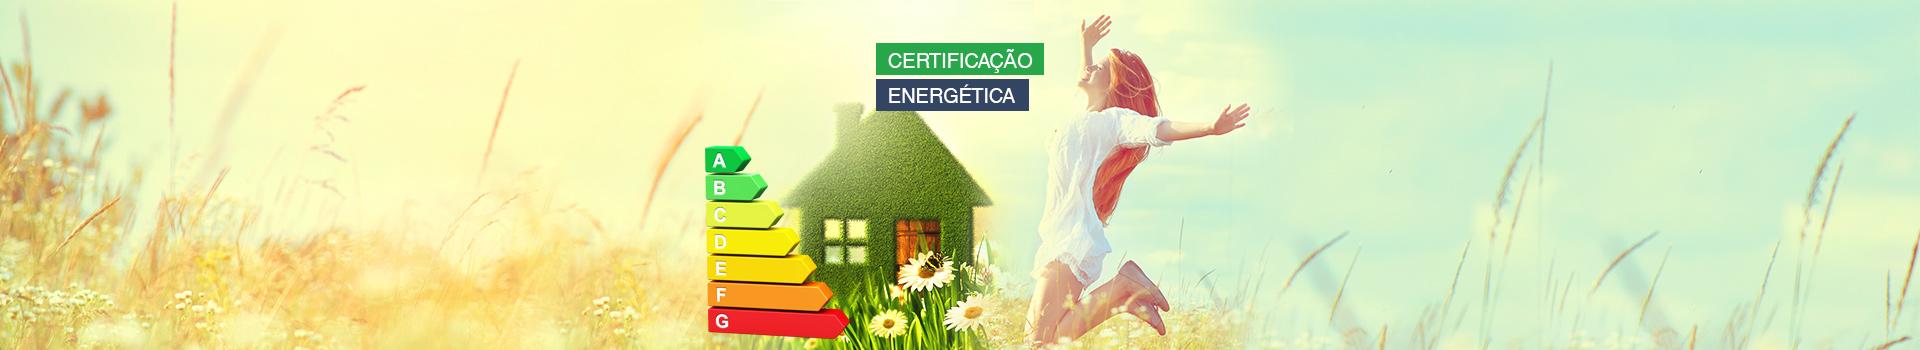 banner_certificacao_energetica